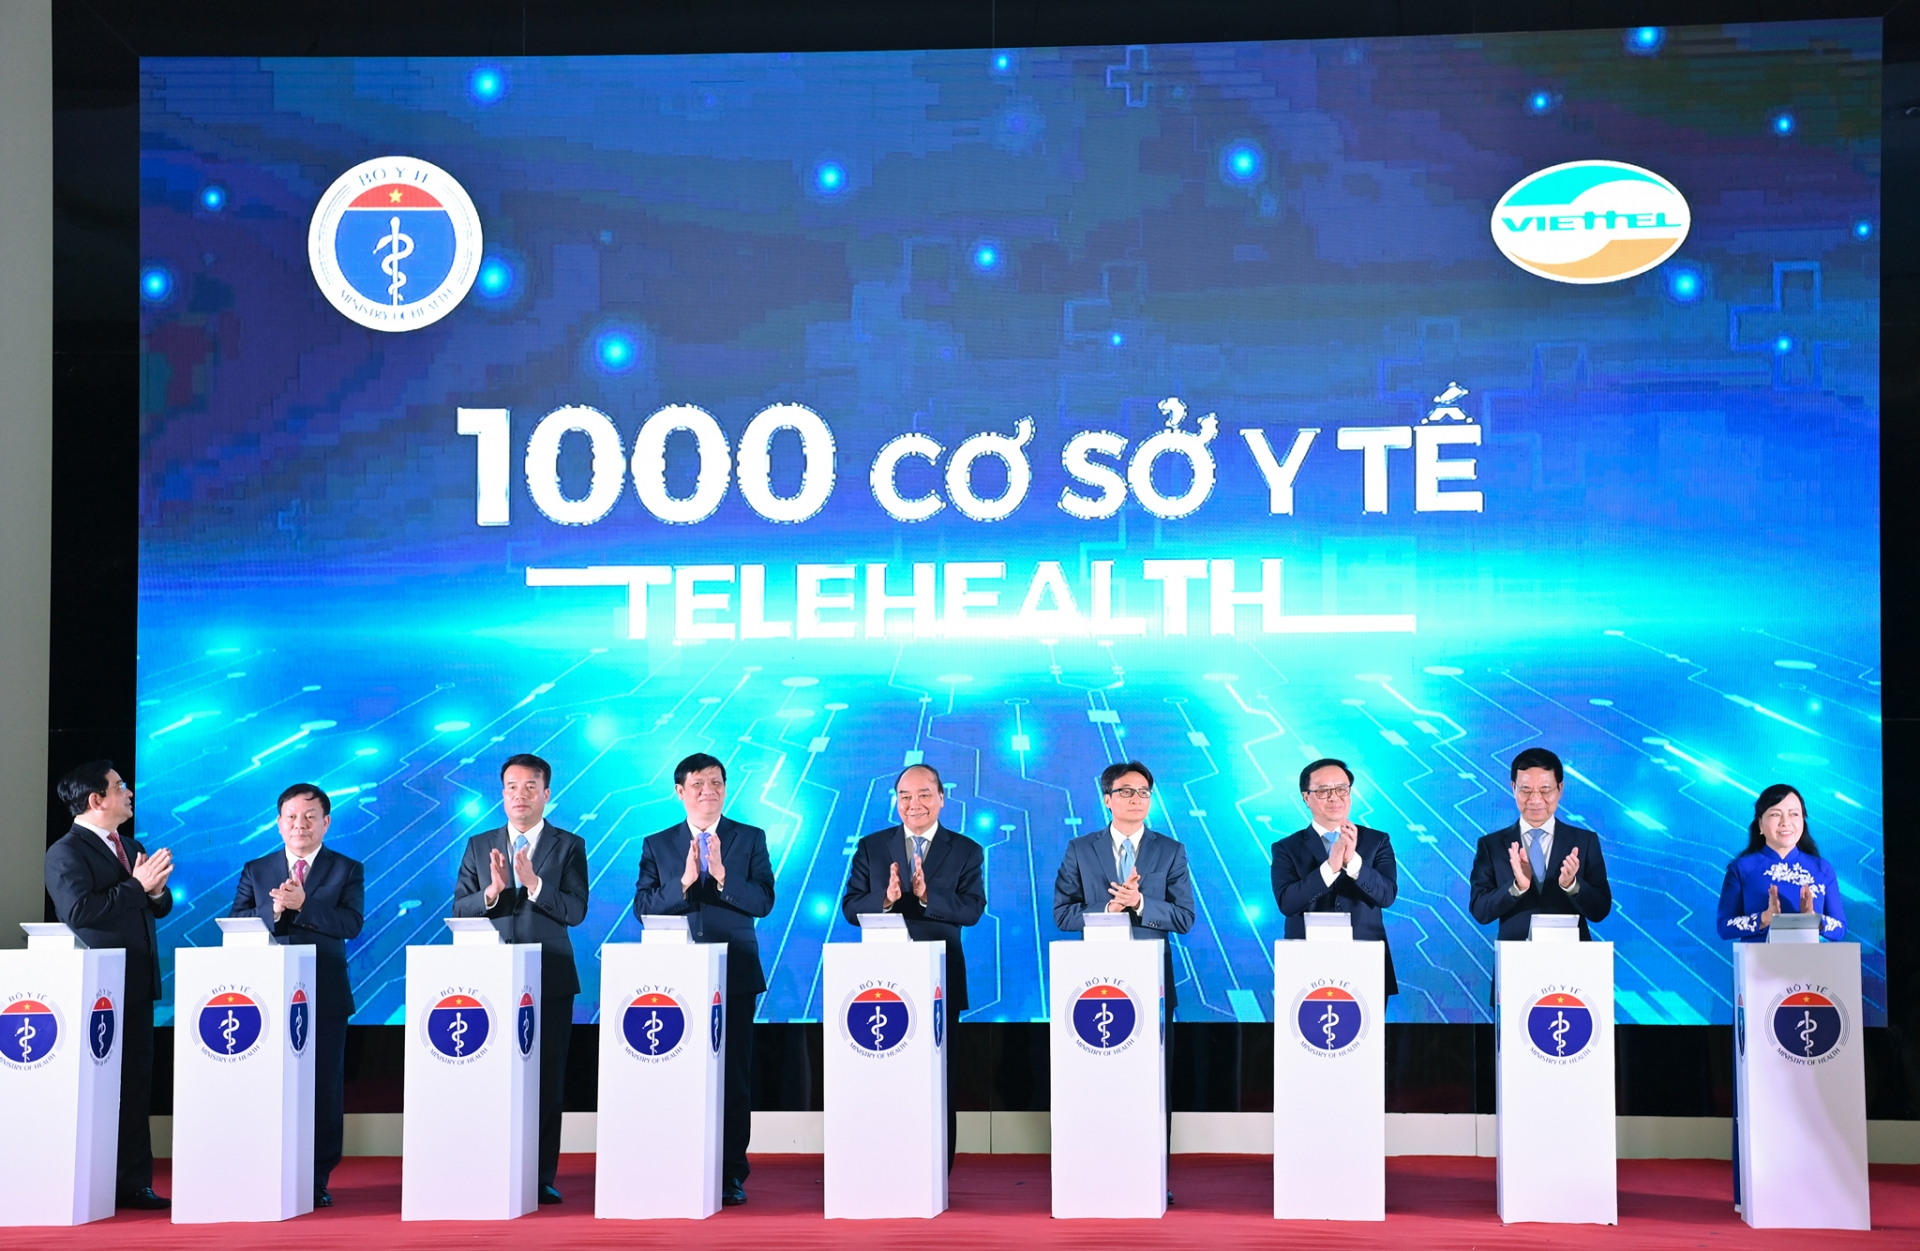 Vietnamese healthcare marks important digital milestone of 1,000 telehealth facilities